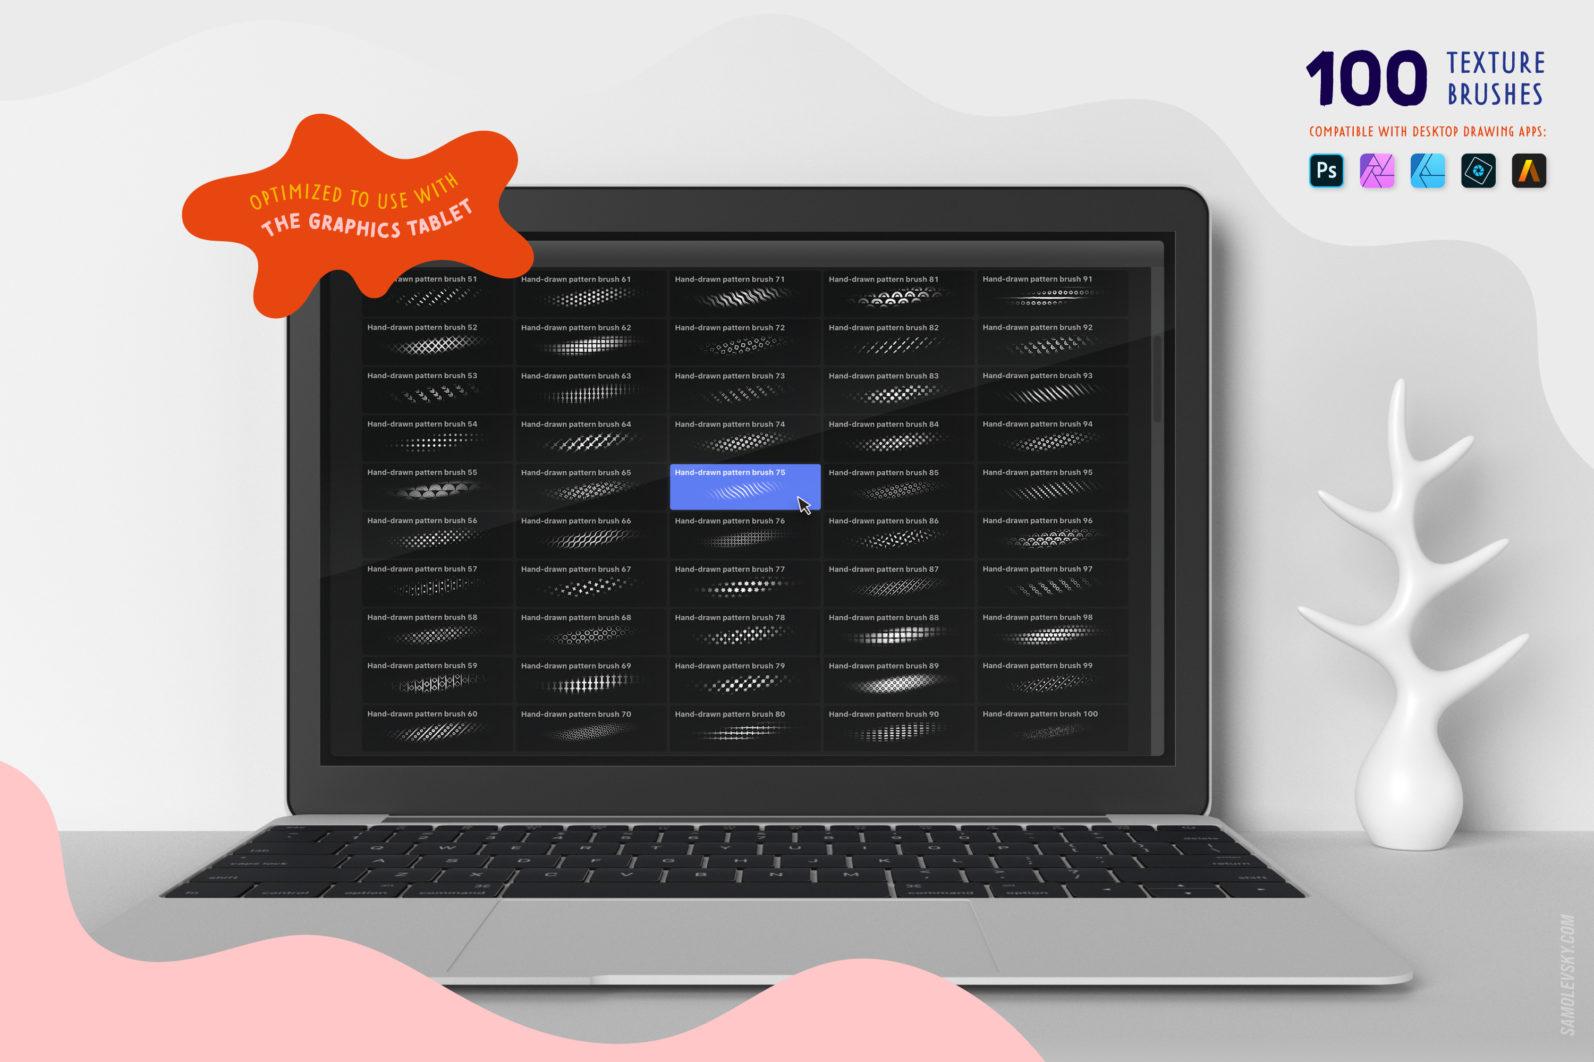 Handmade patterns bundle - 300 seamless patterns, brushes, and shapes - Samolevsky.com Handmade patterns bundle 22 scaled -